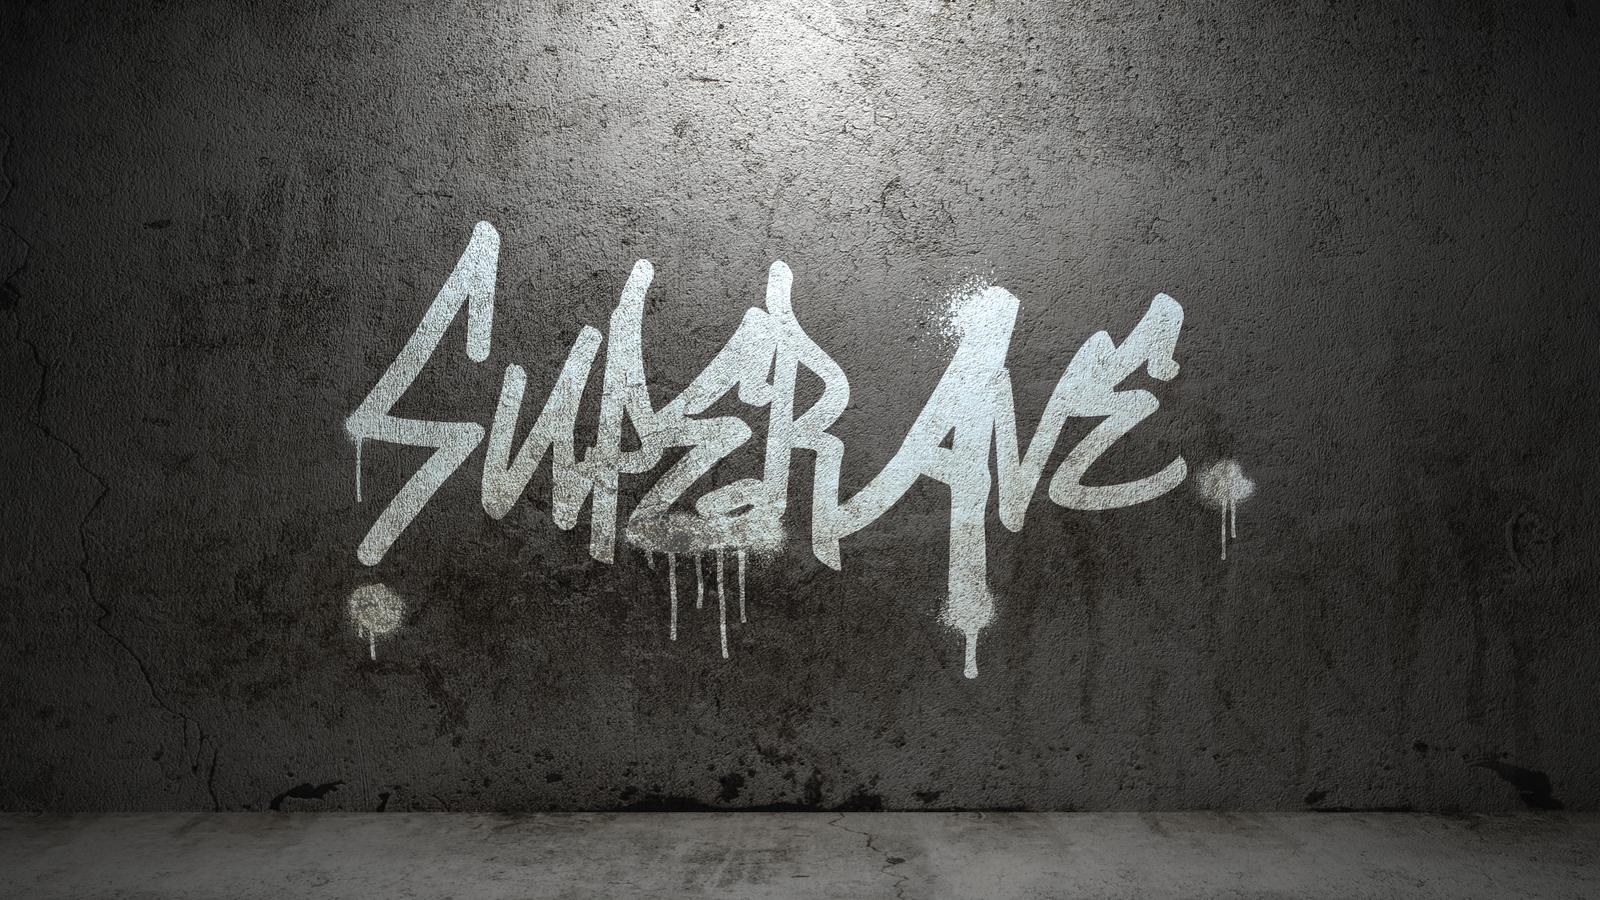 SuperAve